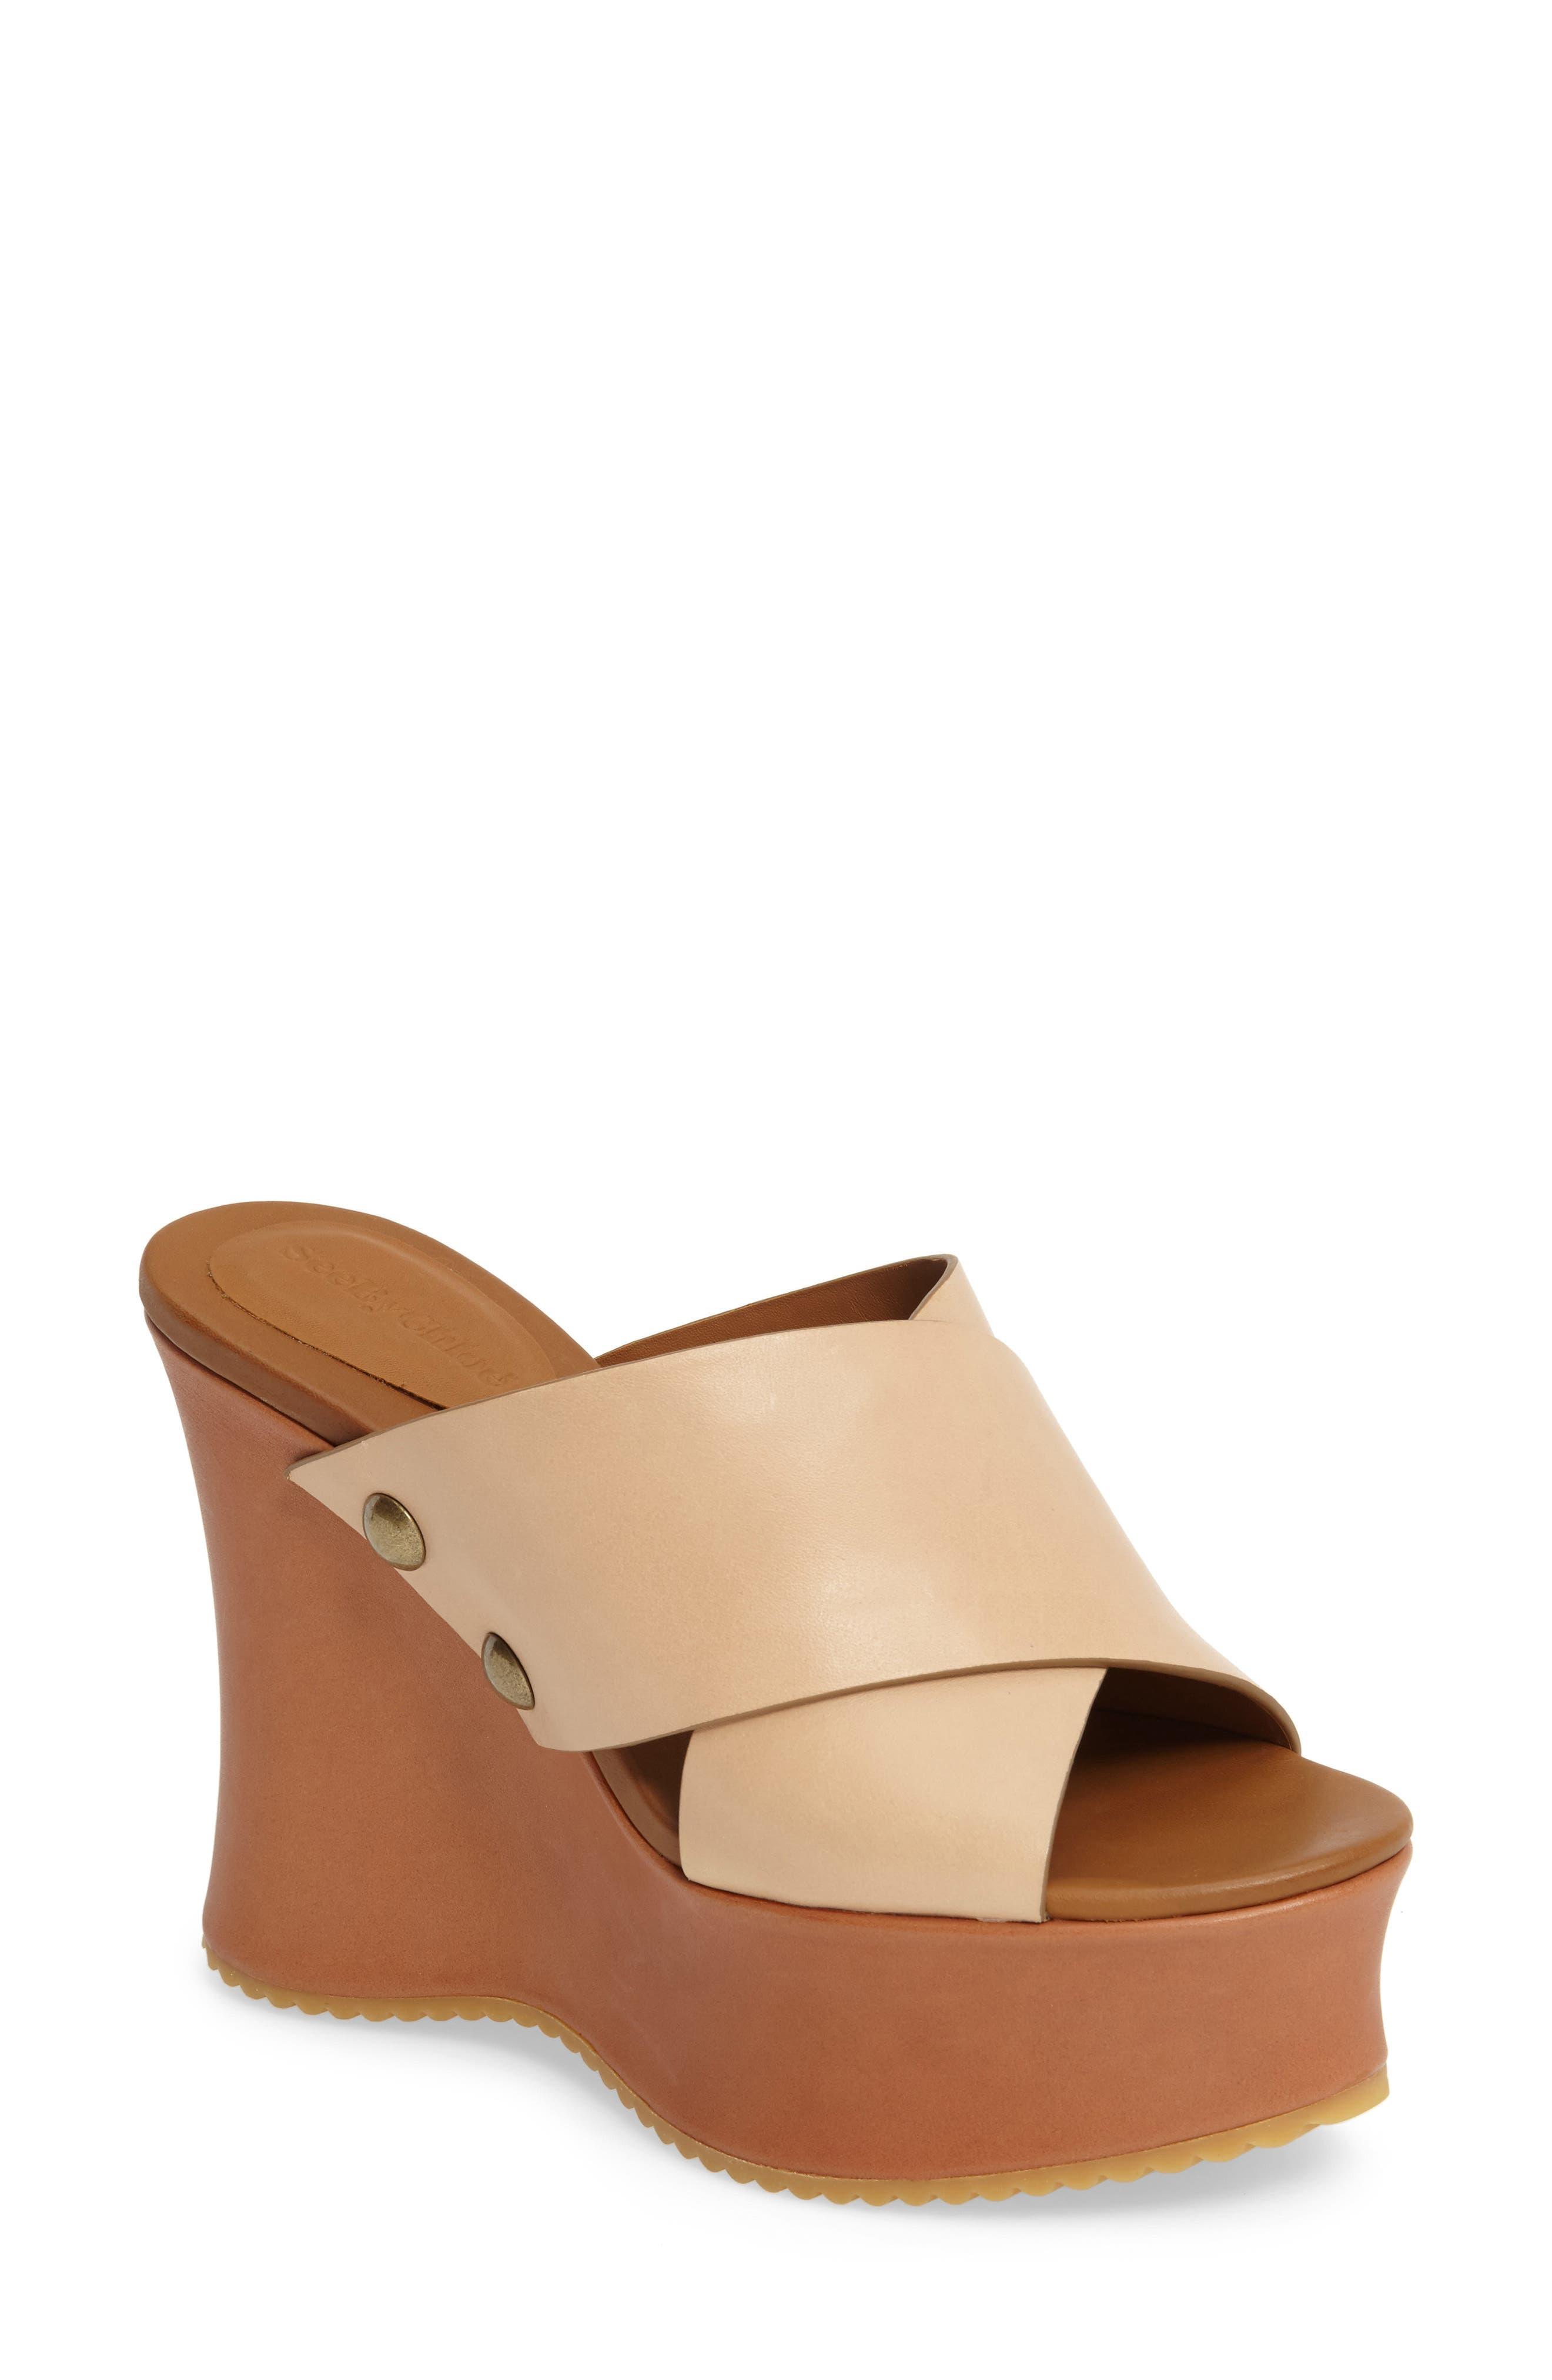 Main Image - See by Chloé Maya Platform Sandal (Women)